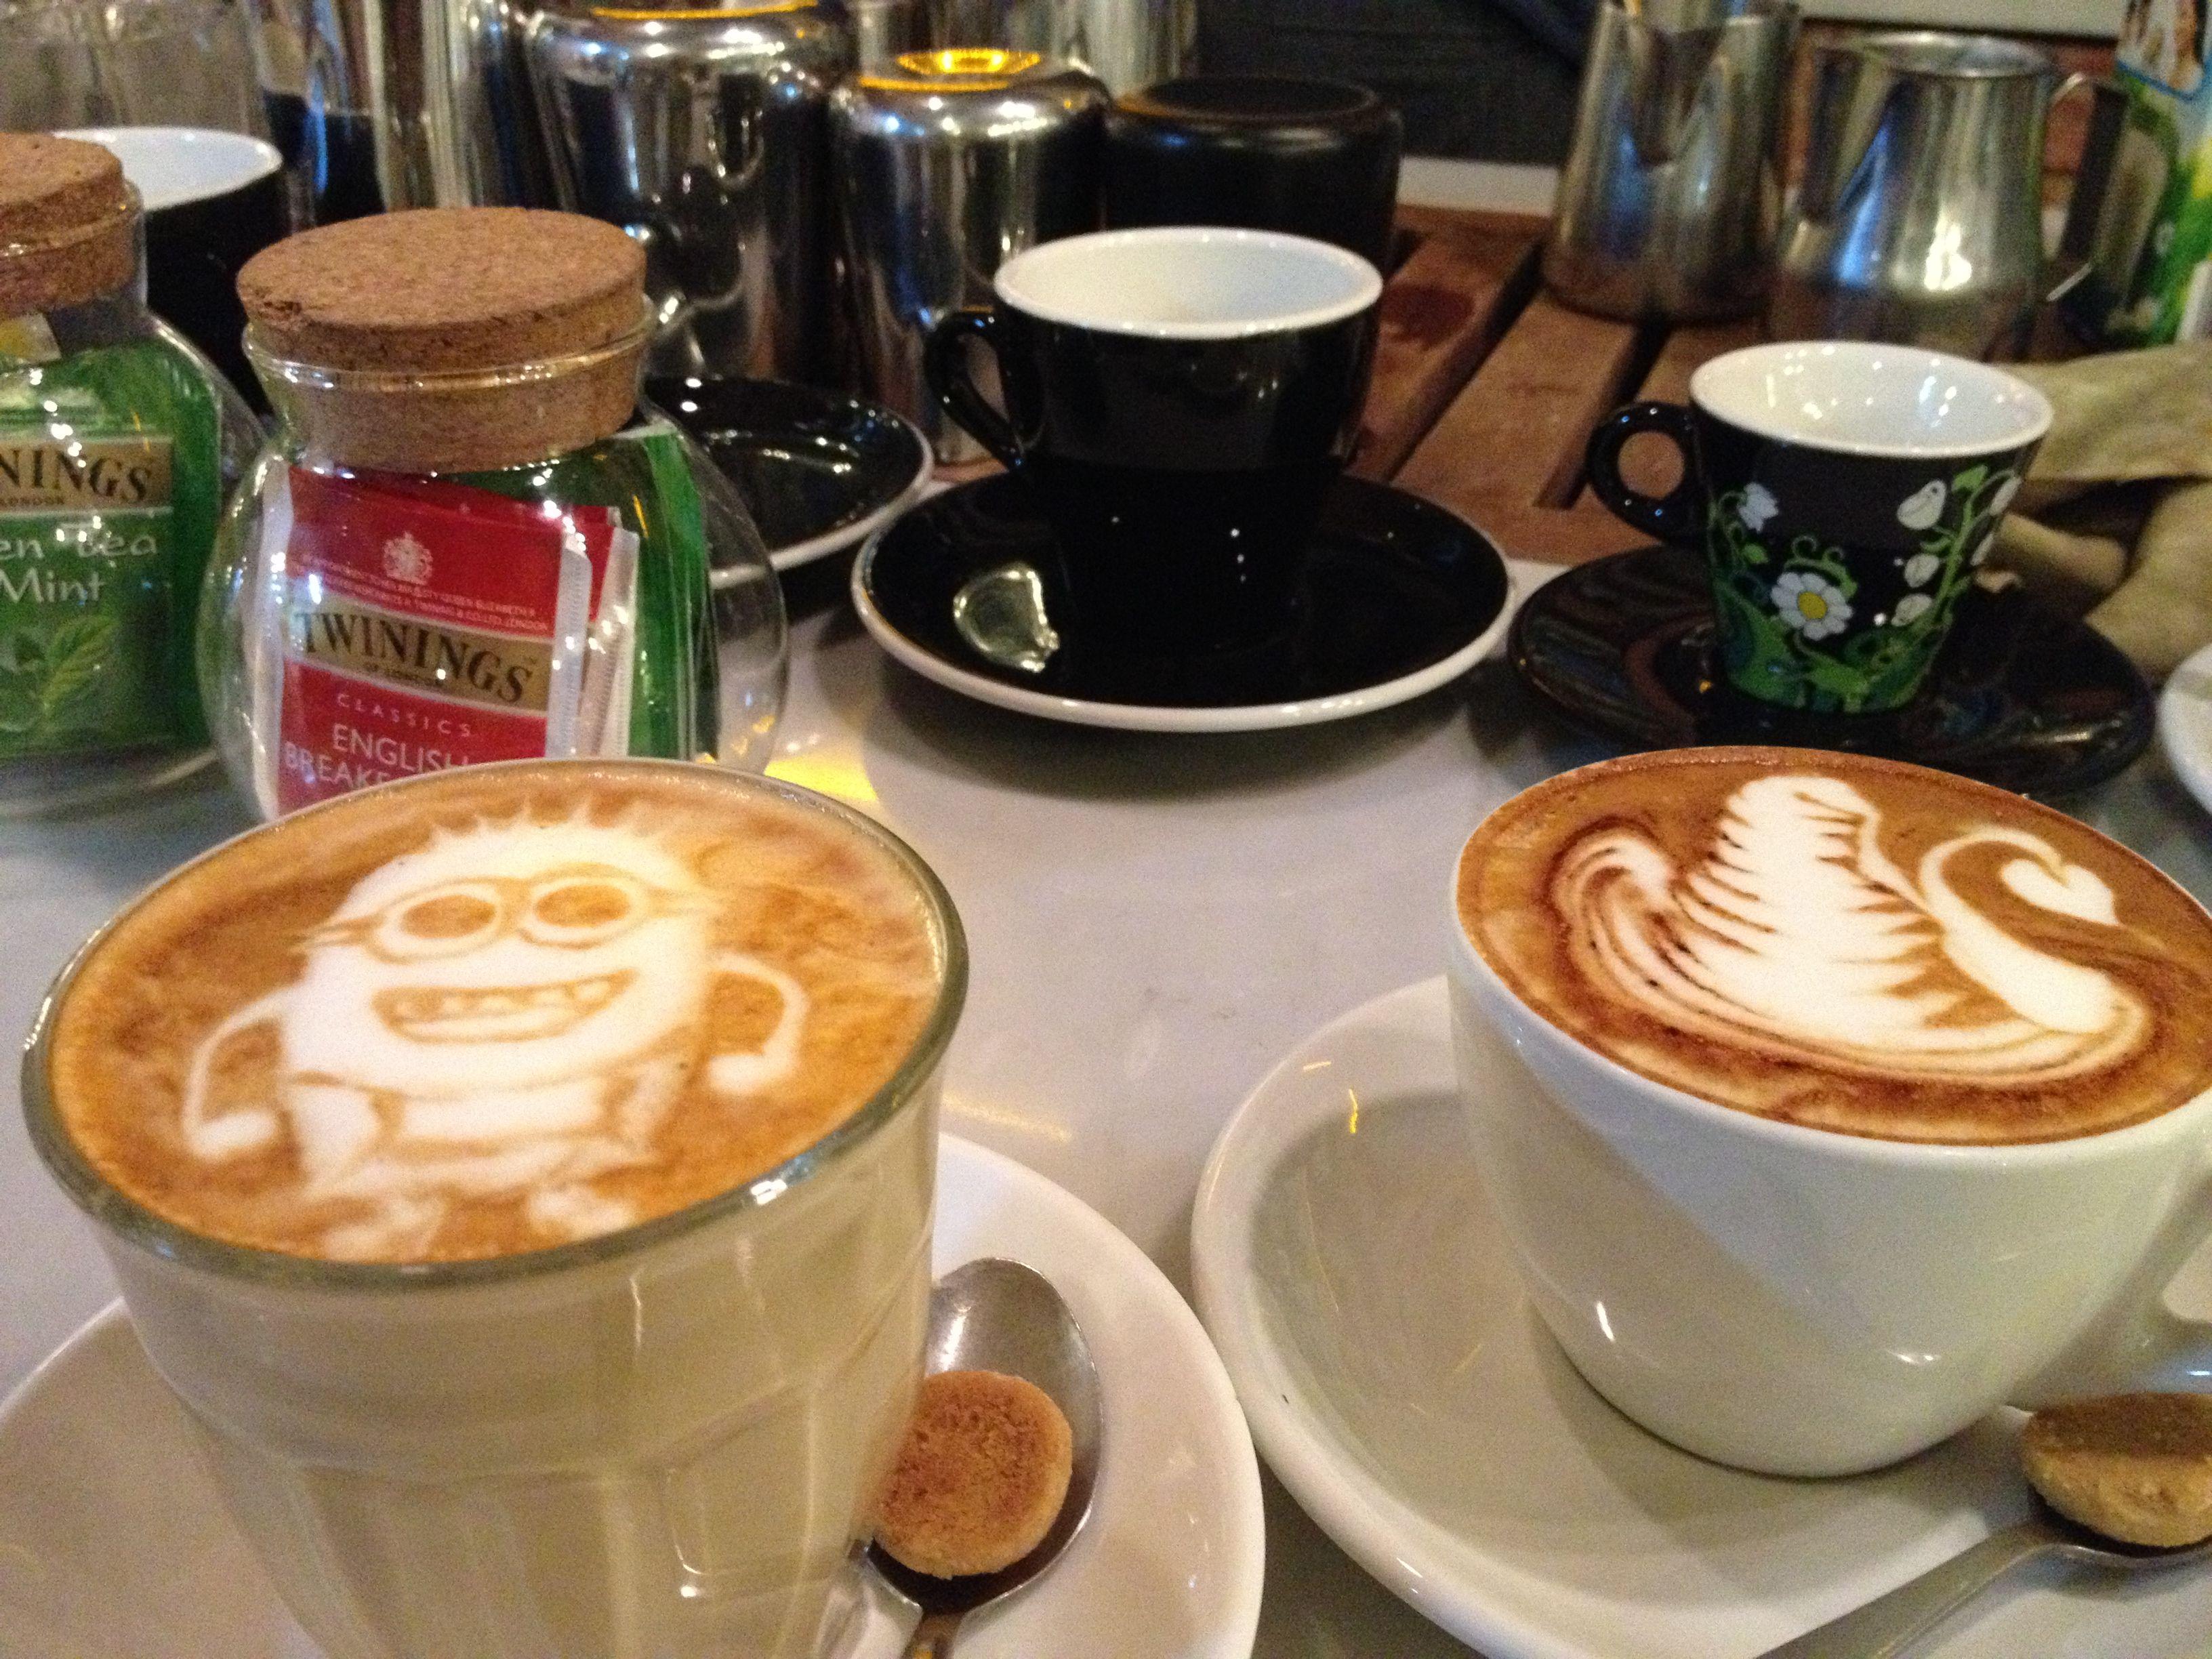 Noah's Barn latte minion & magic phoenix